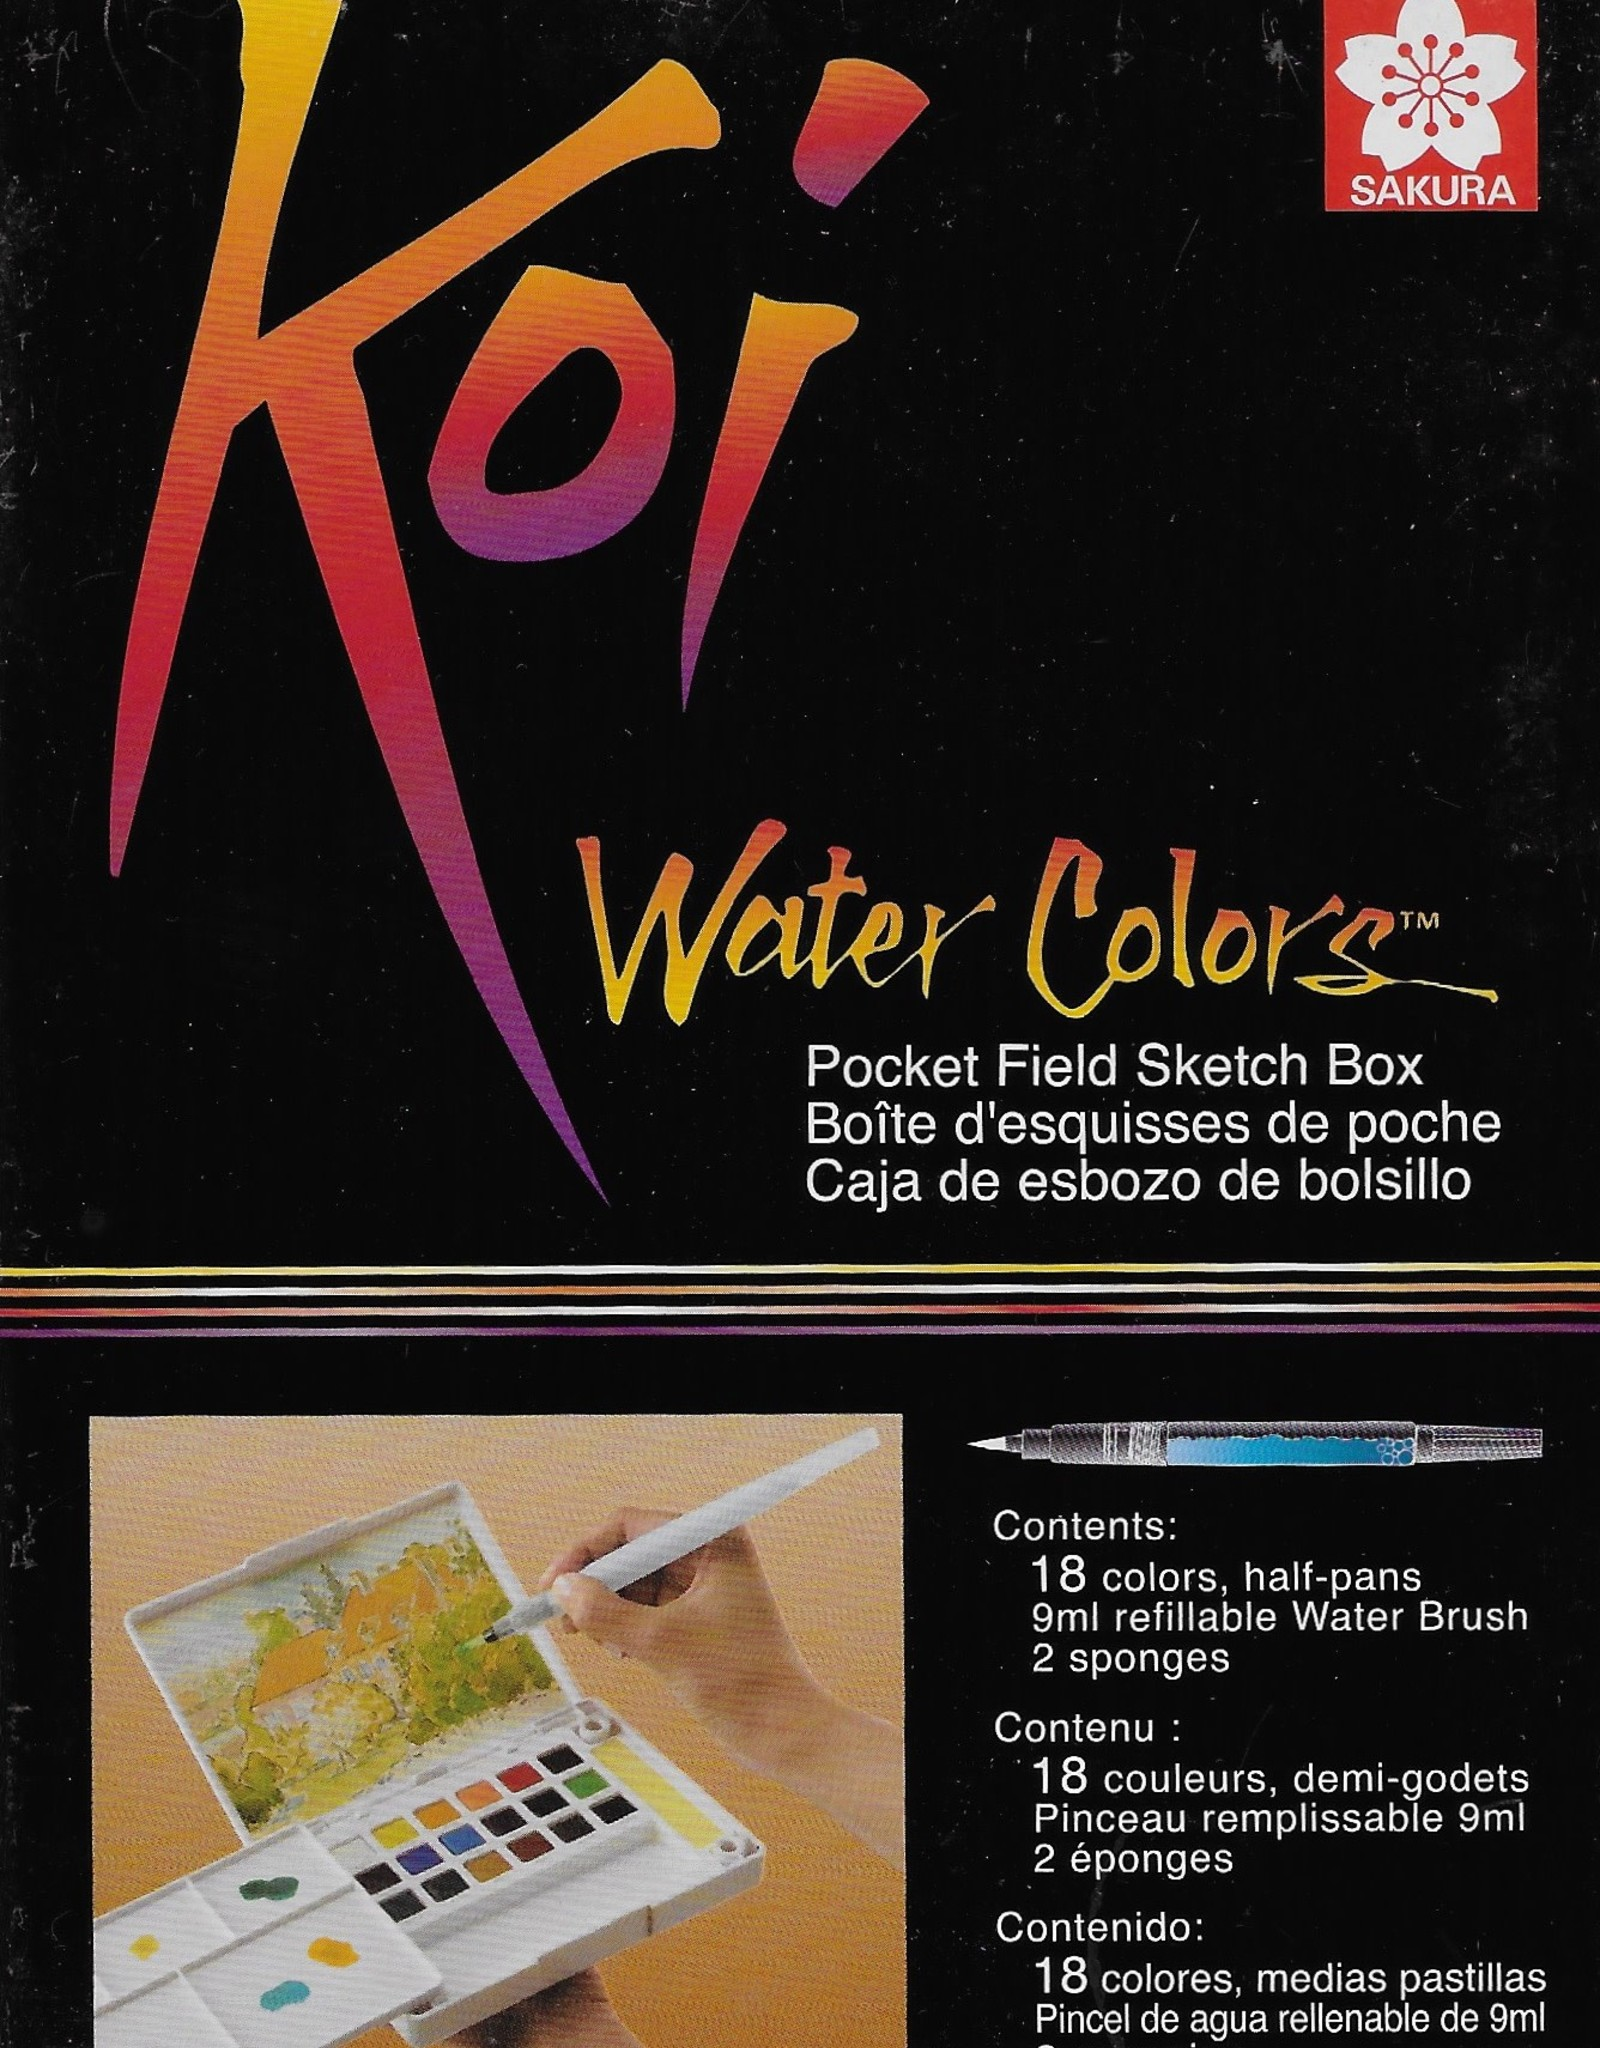 Sakura Koi Watercolors Pocket Field Sketch Box Set, 18 Colors